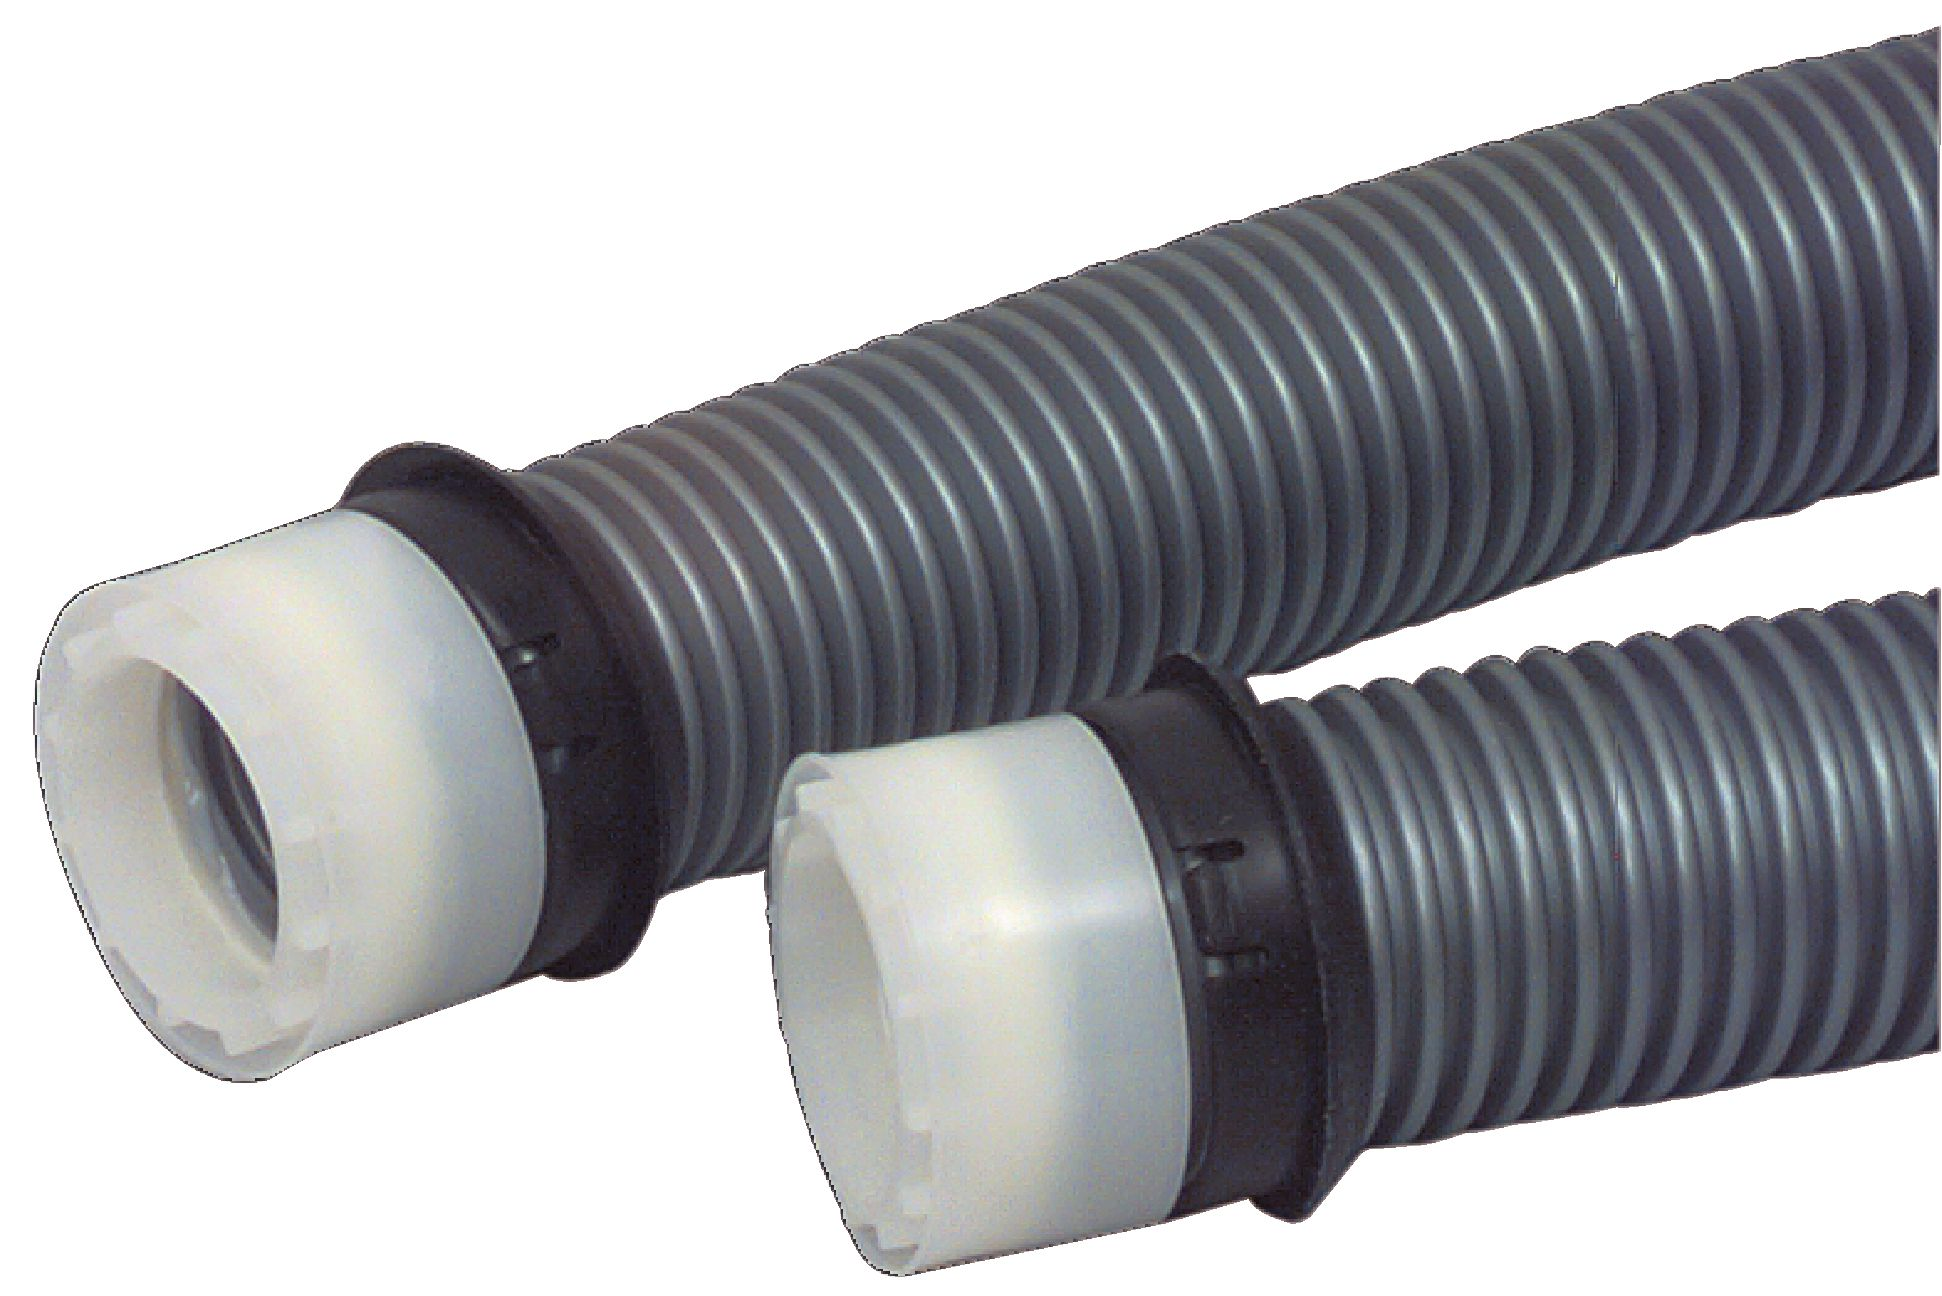 Sací hadice k vysavači 1.8 m 32 mm Fixapart W7-86004